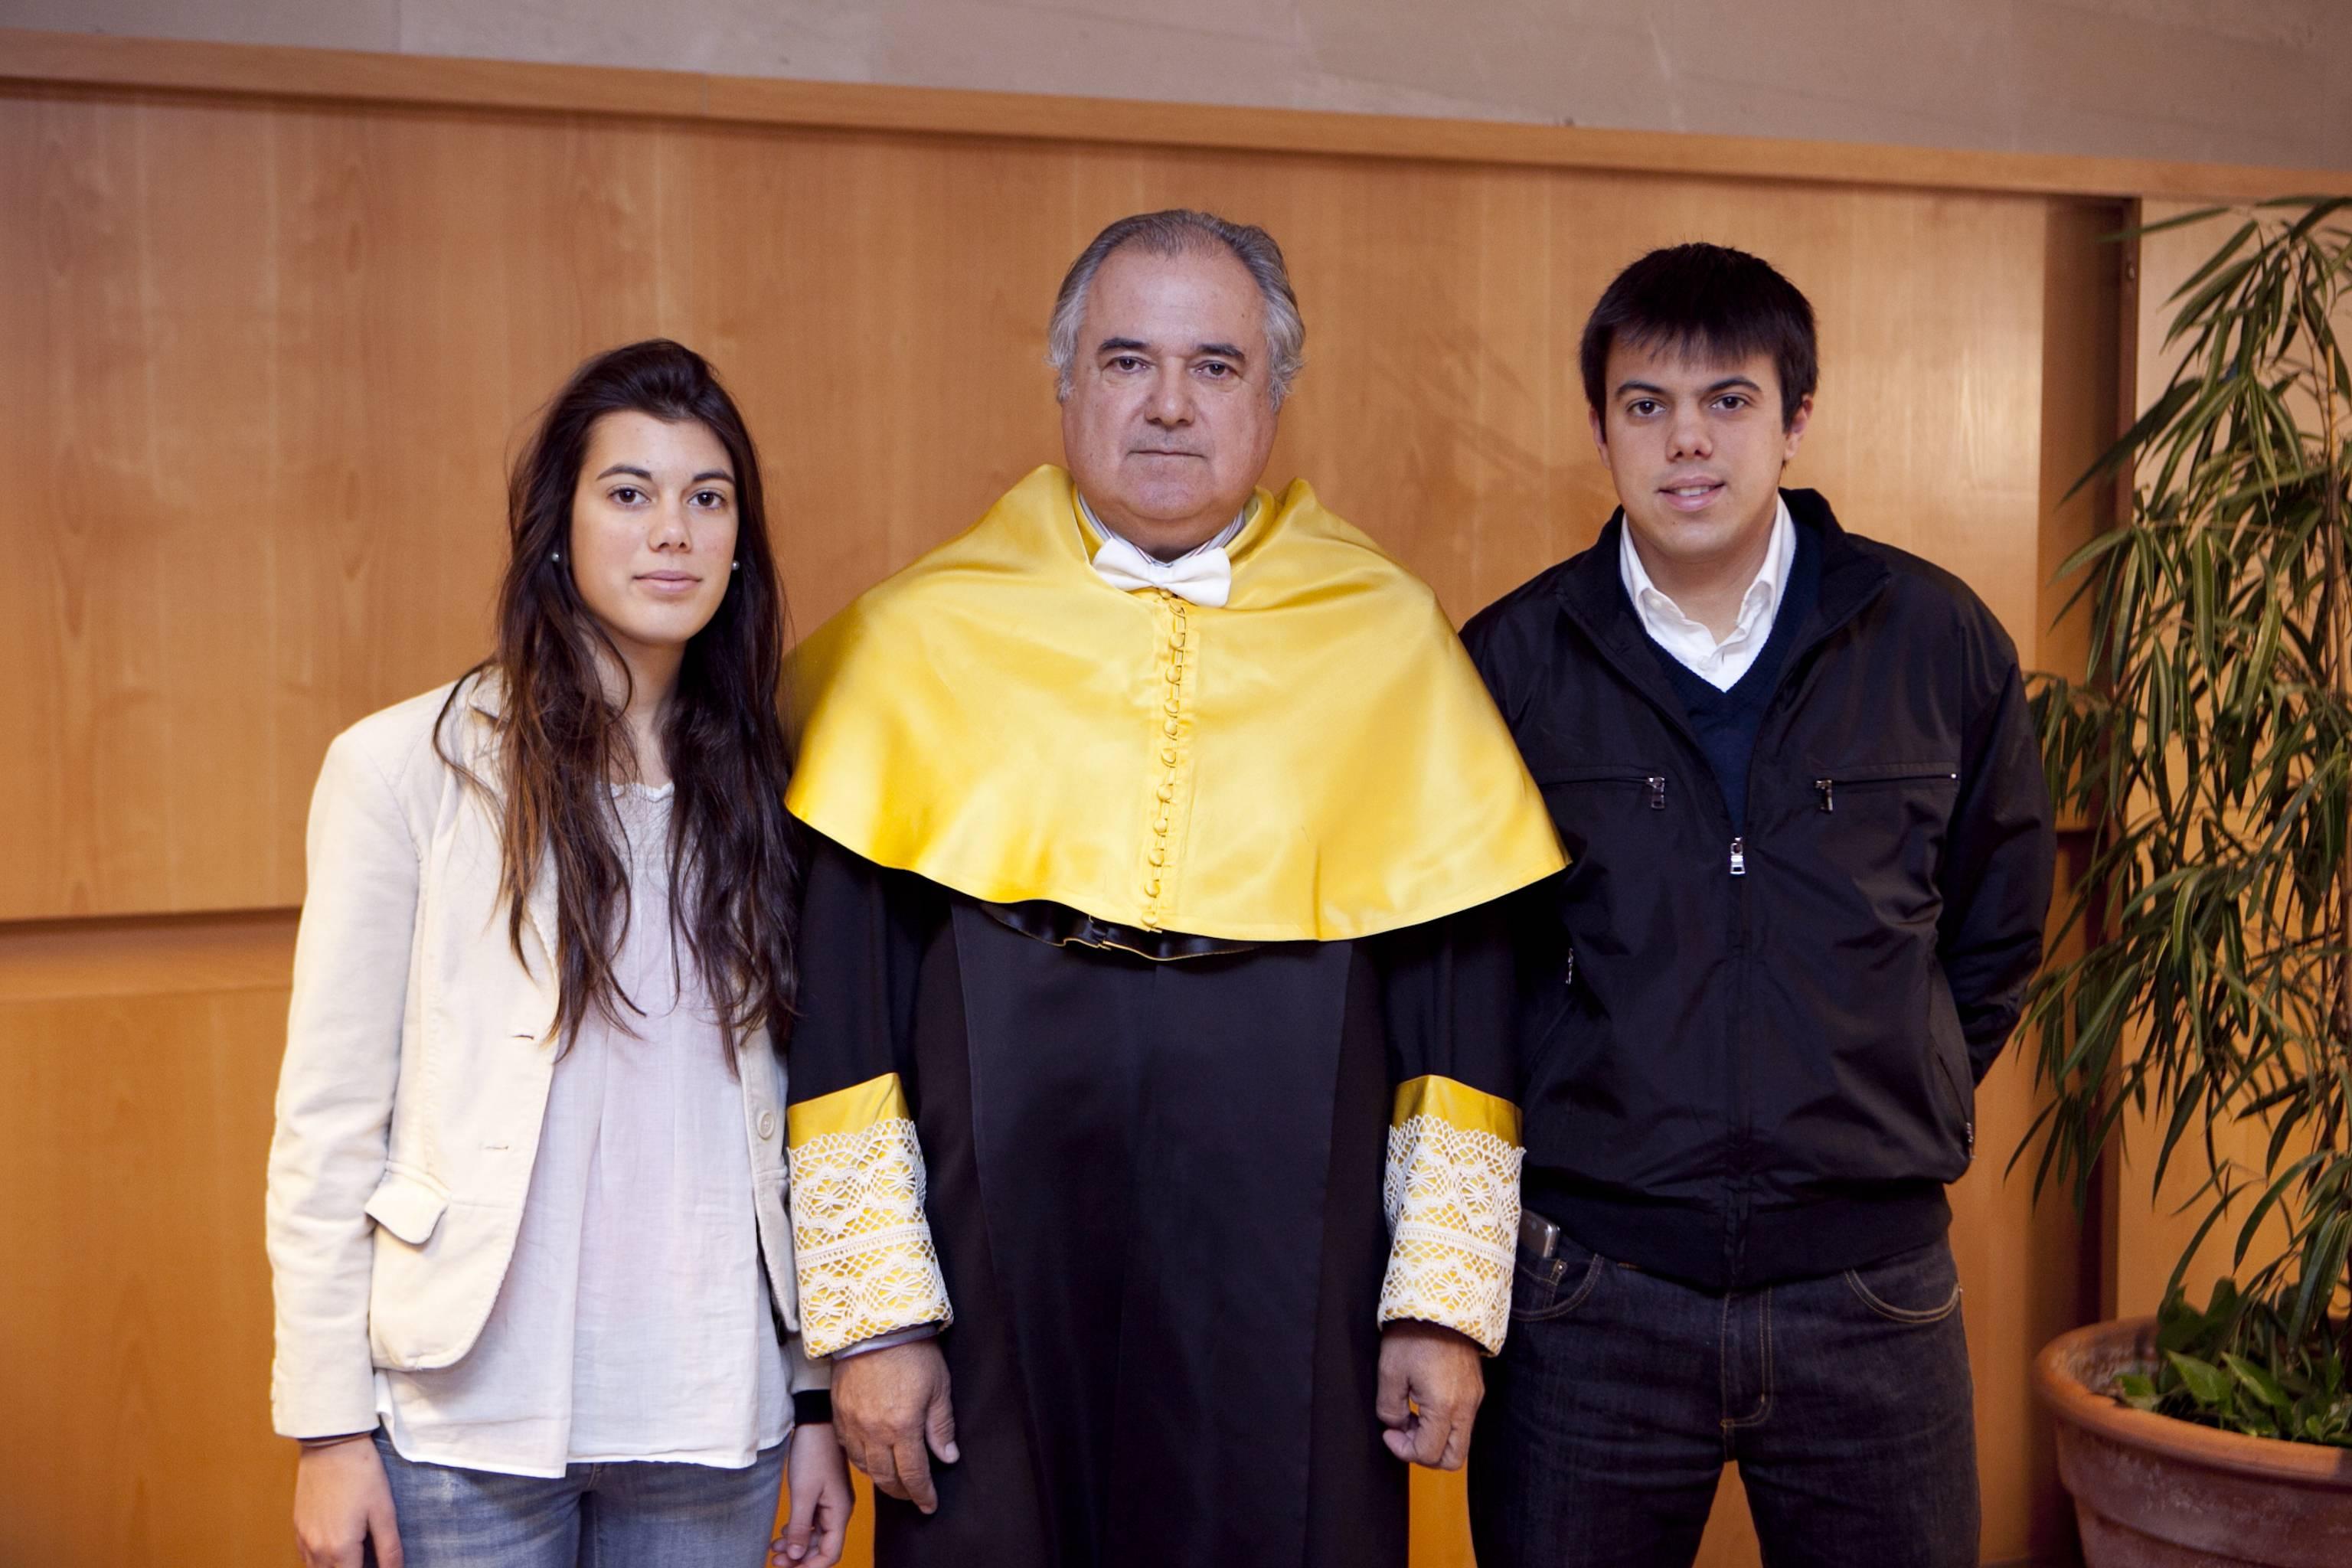 doctor-honoris-causa-luis-gamir_mg_0550.jpg